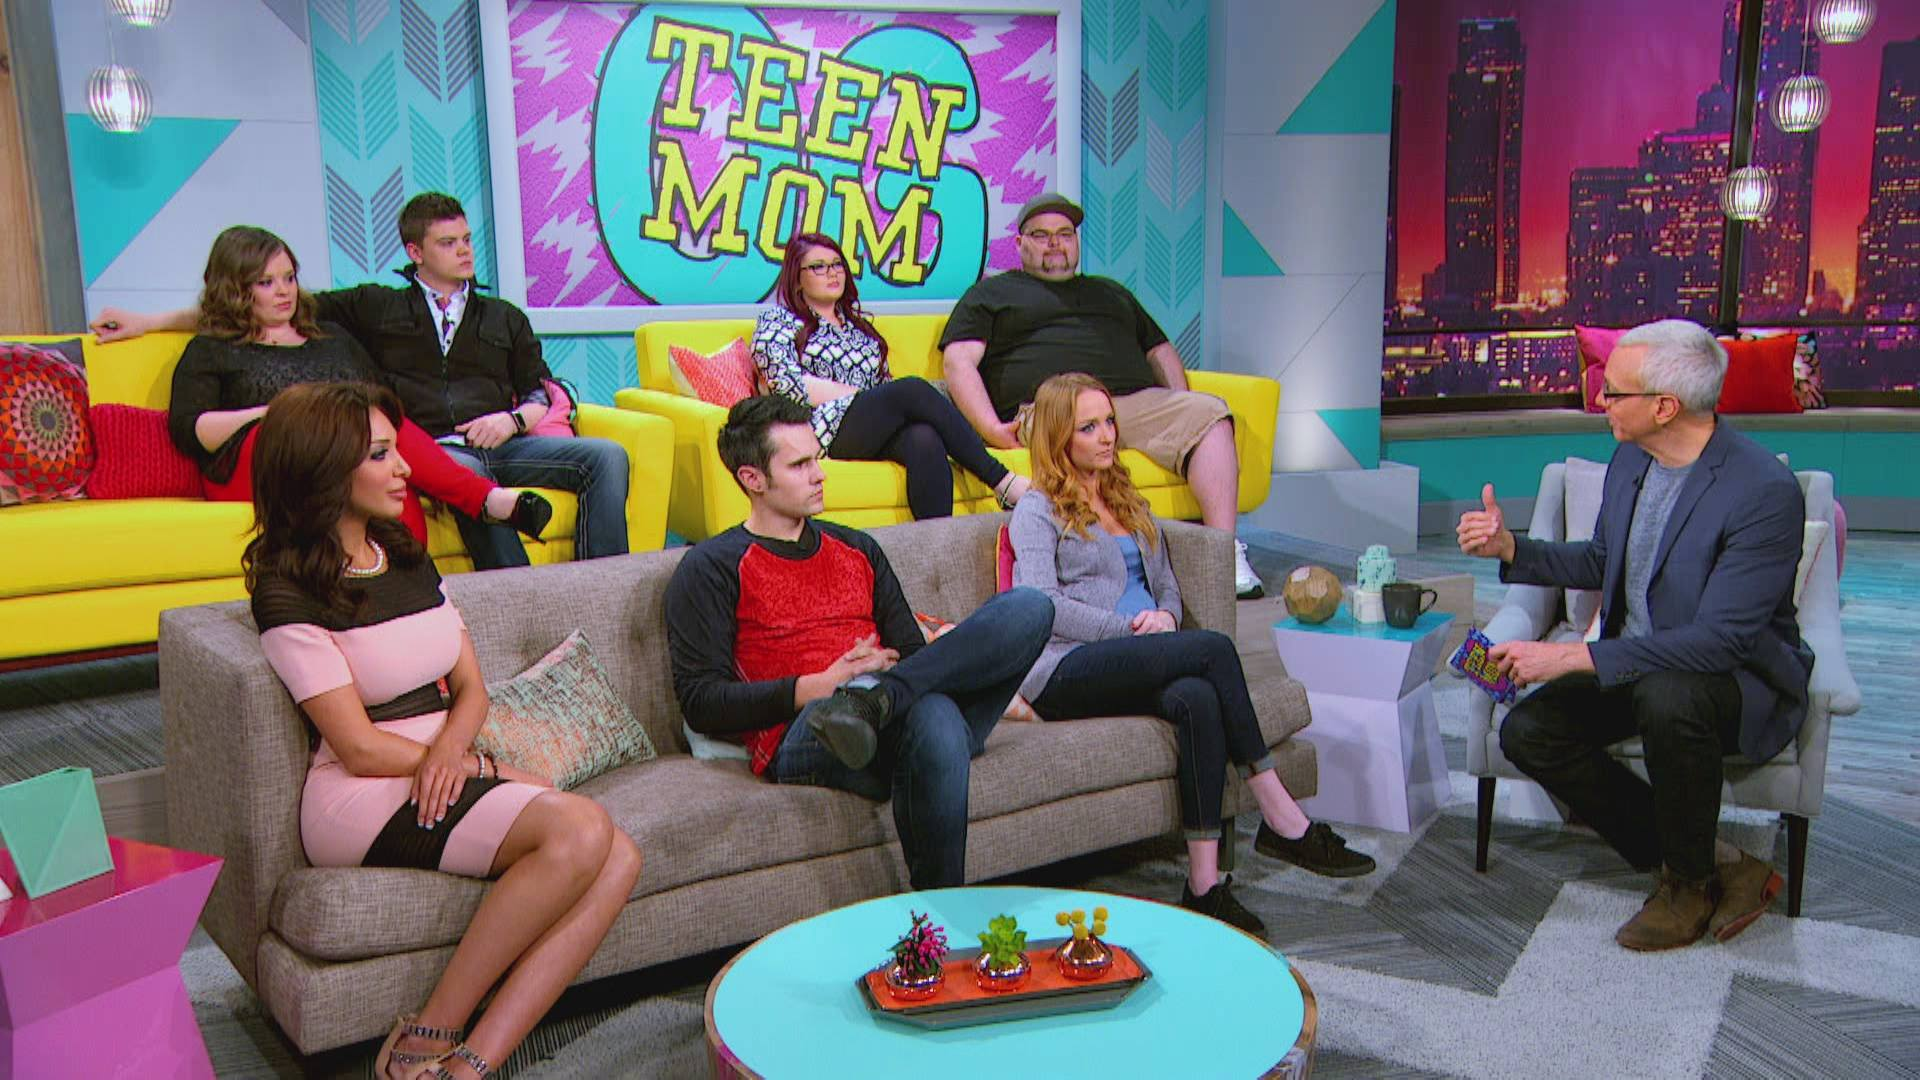 Teen mom reunion